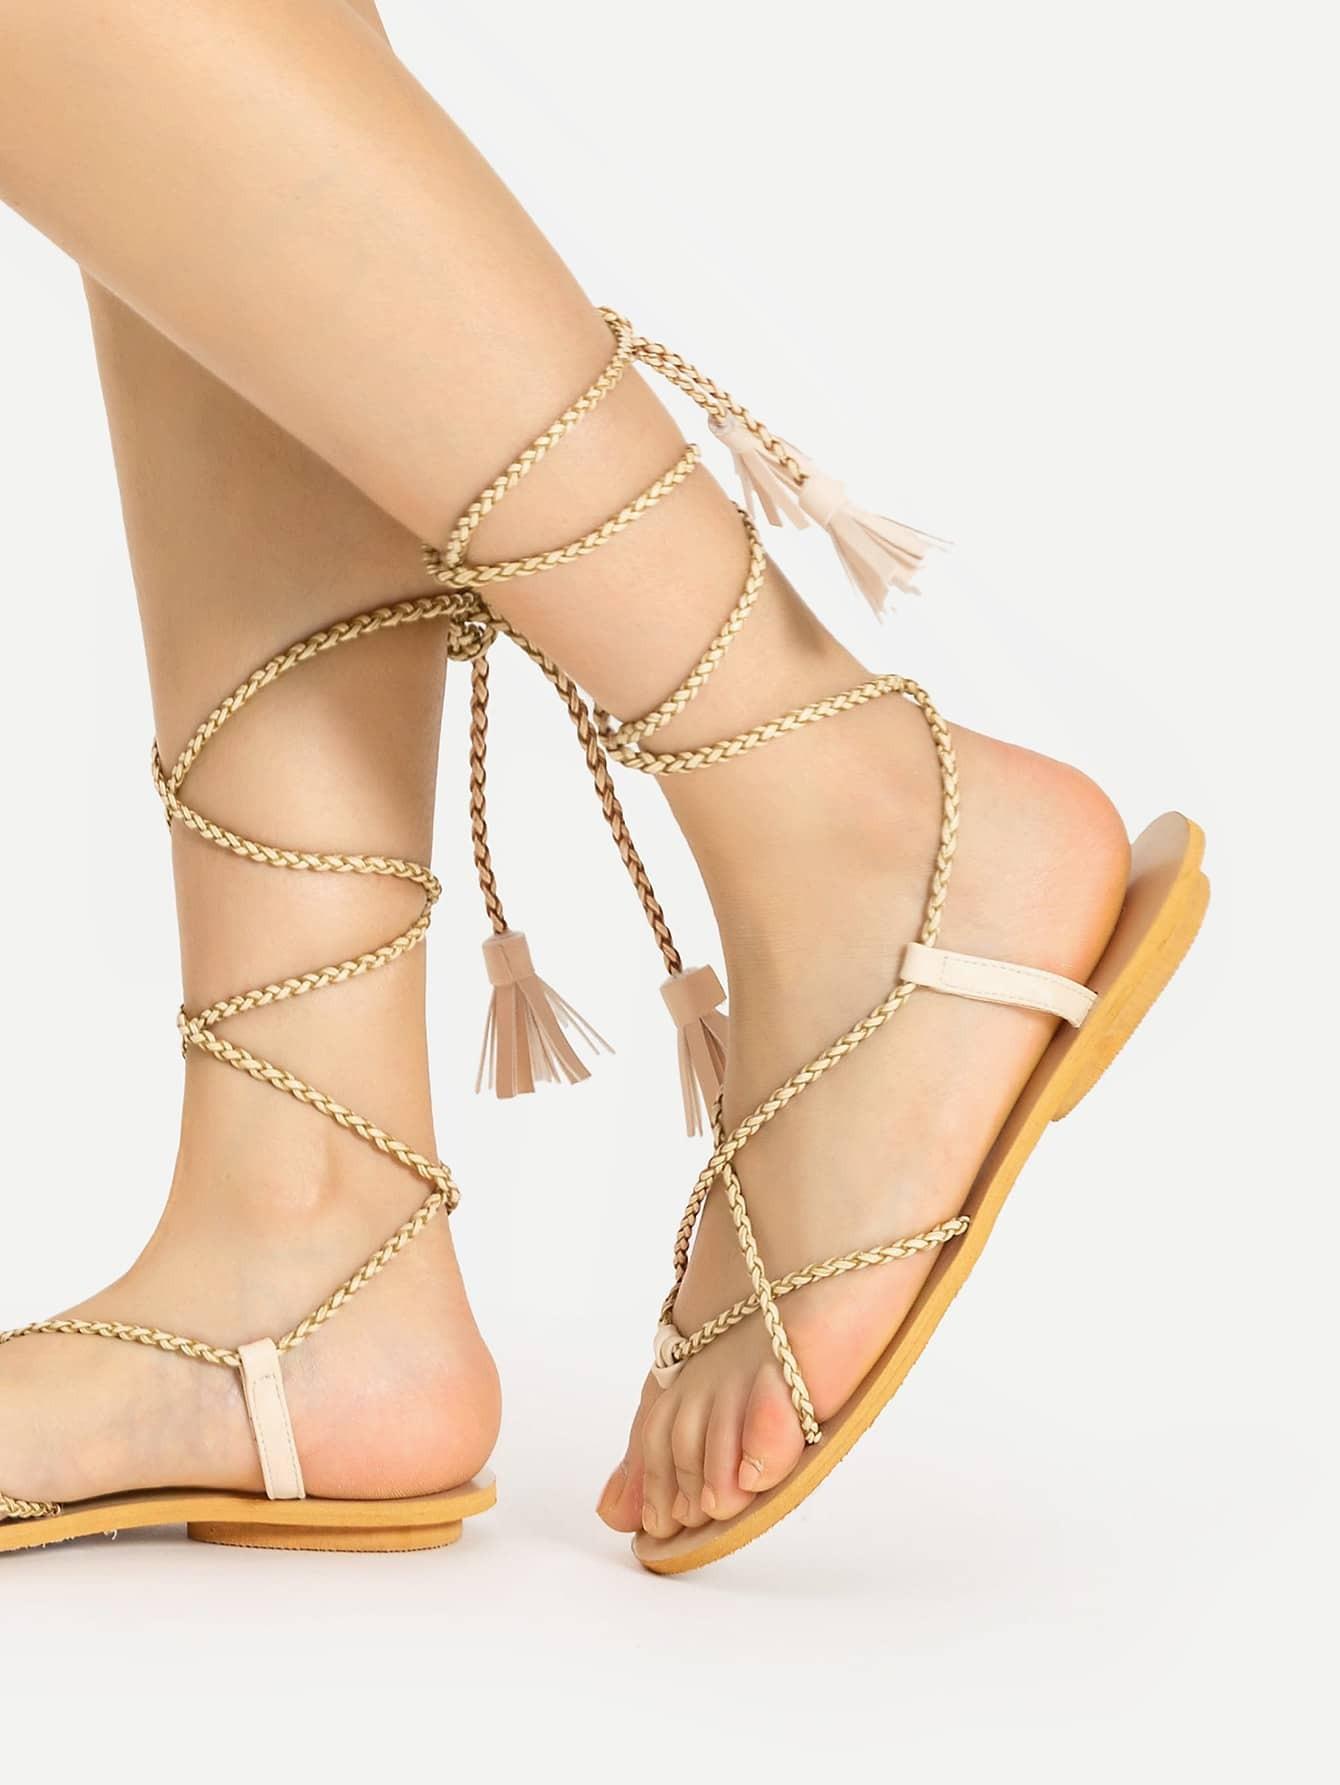 Braided Strap Tassel Tie Flat Sandals shoes170407815